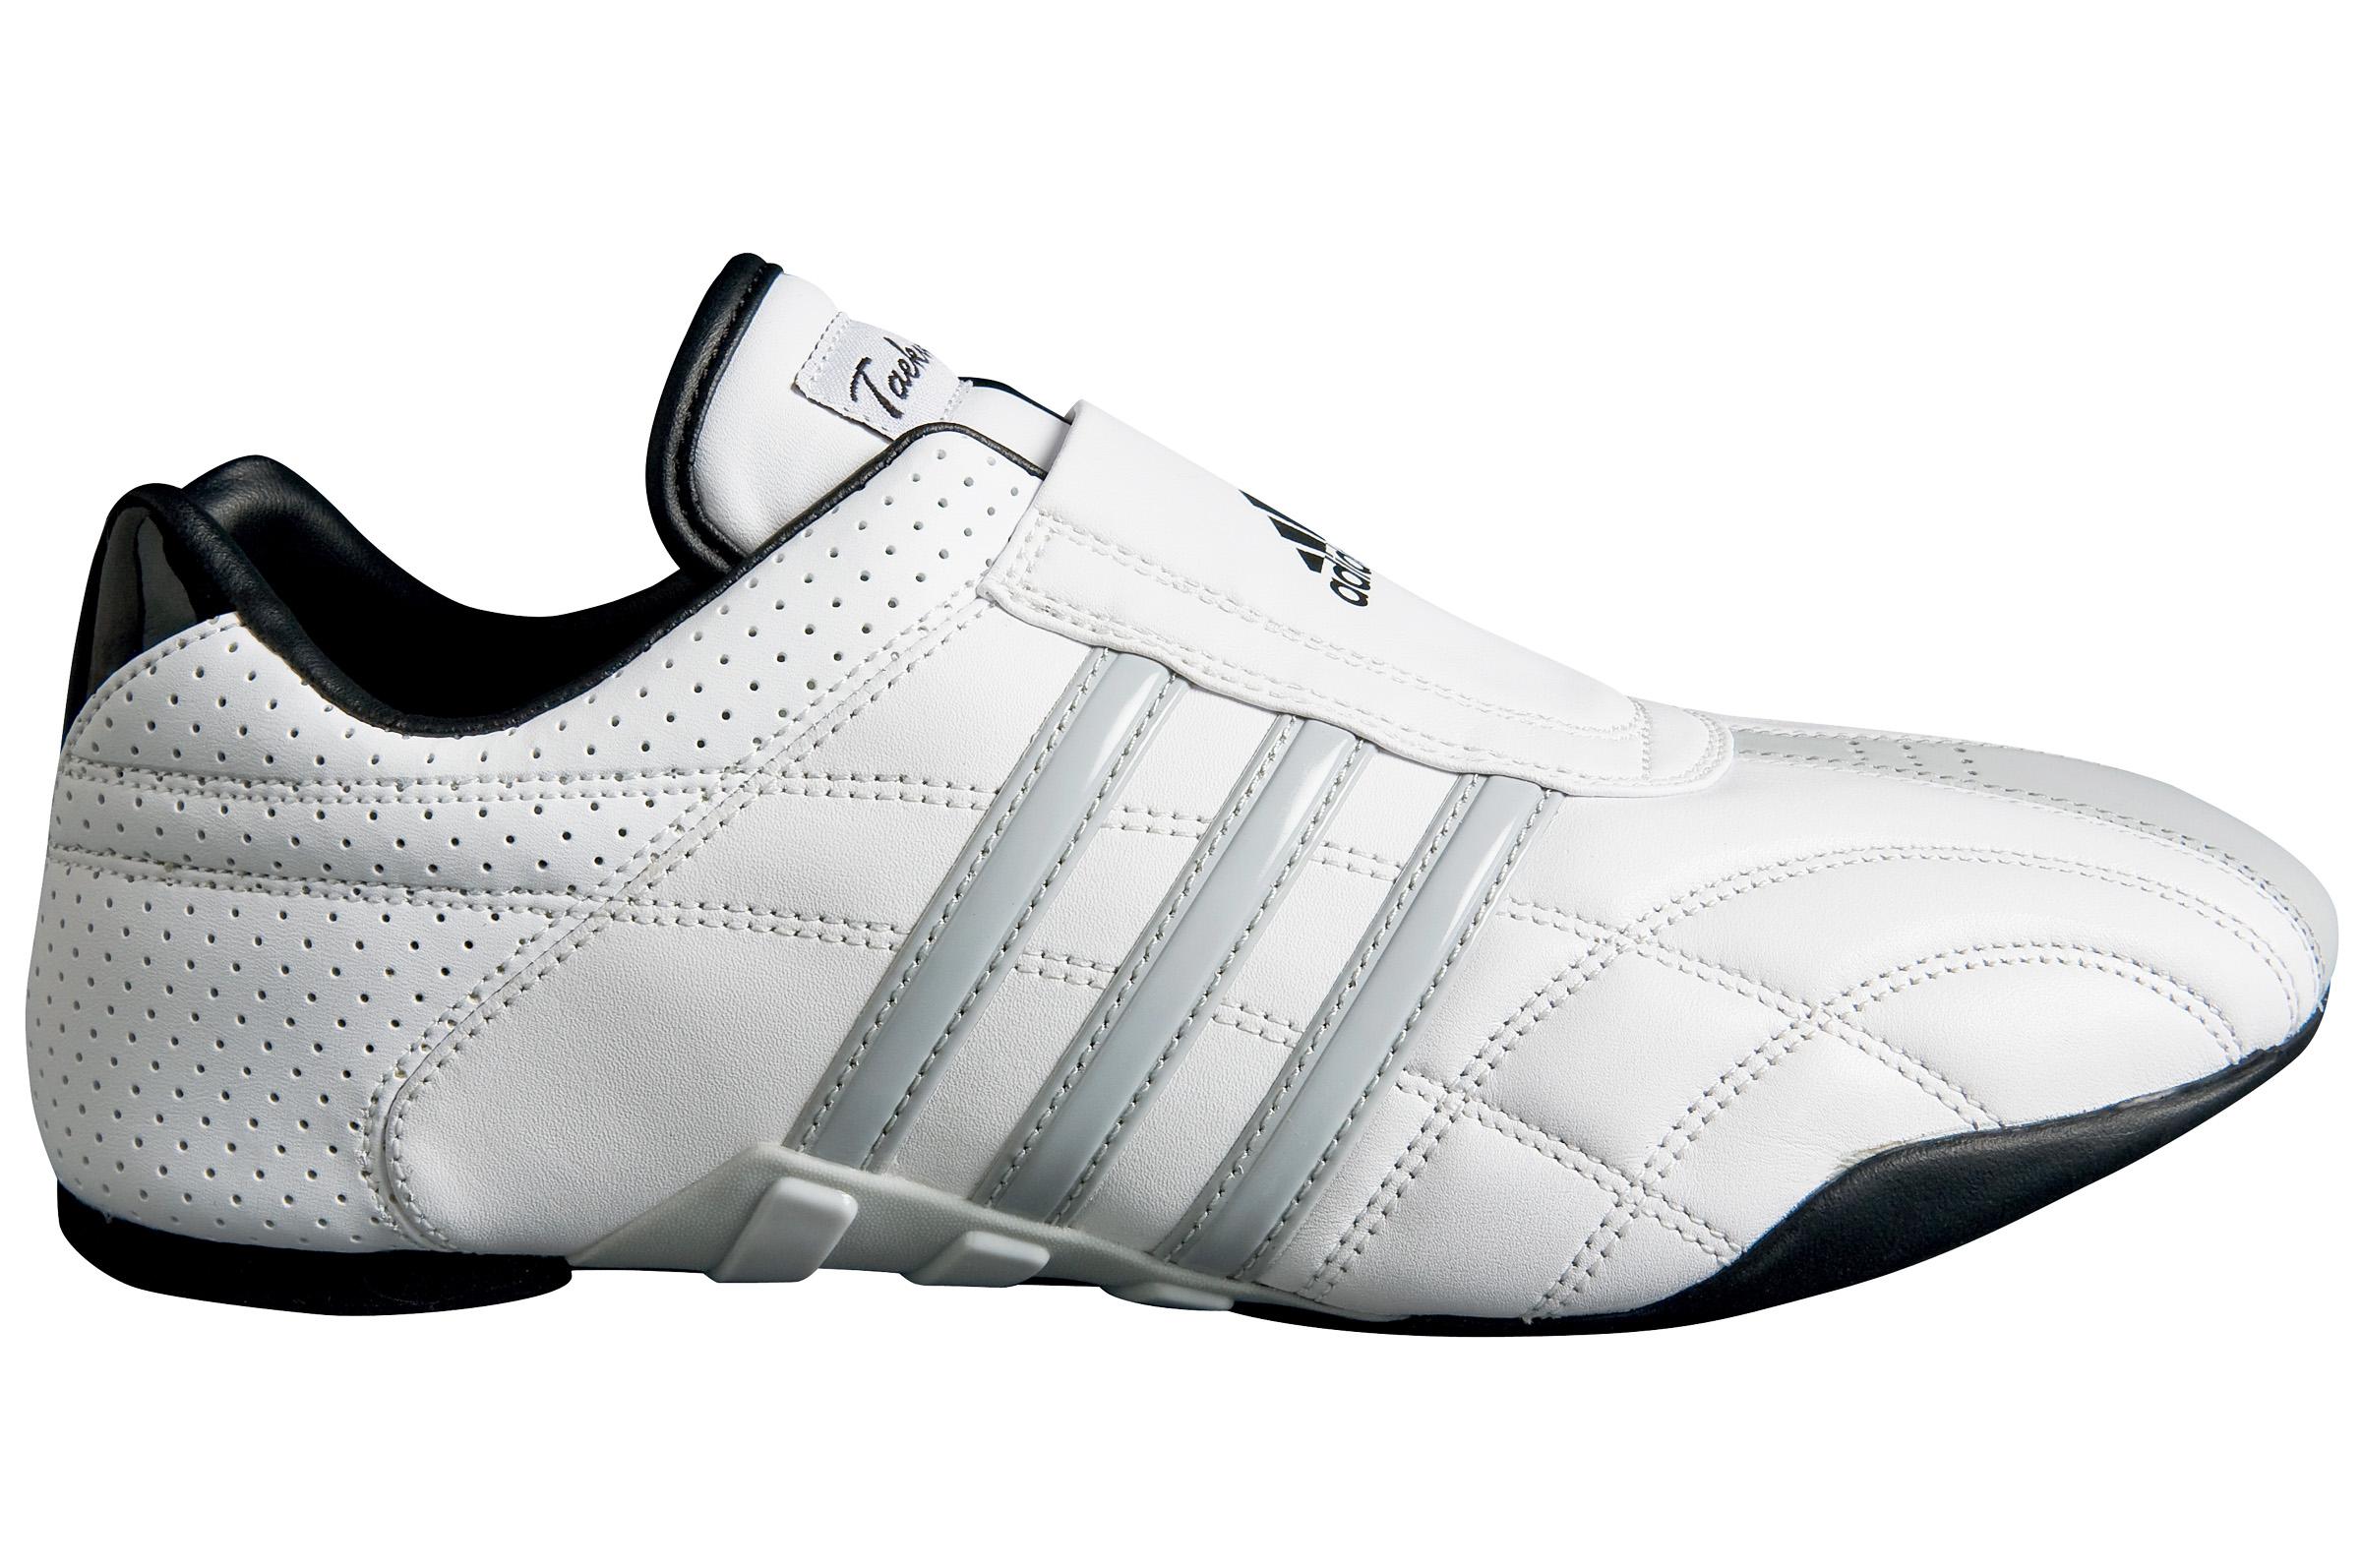 Chaussures de Taekwondo Adidas Adilux